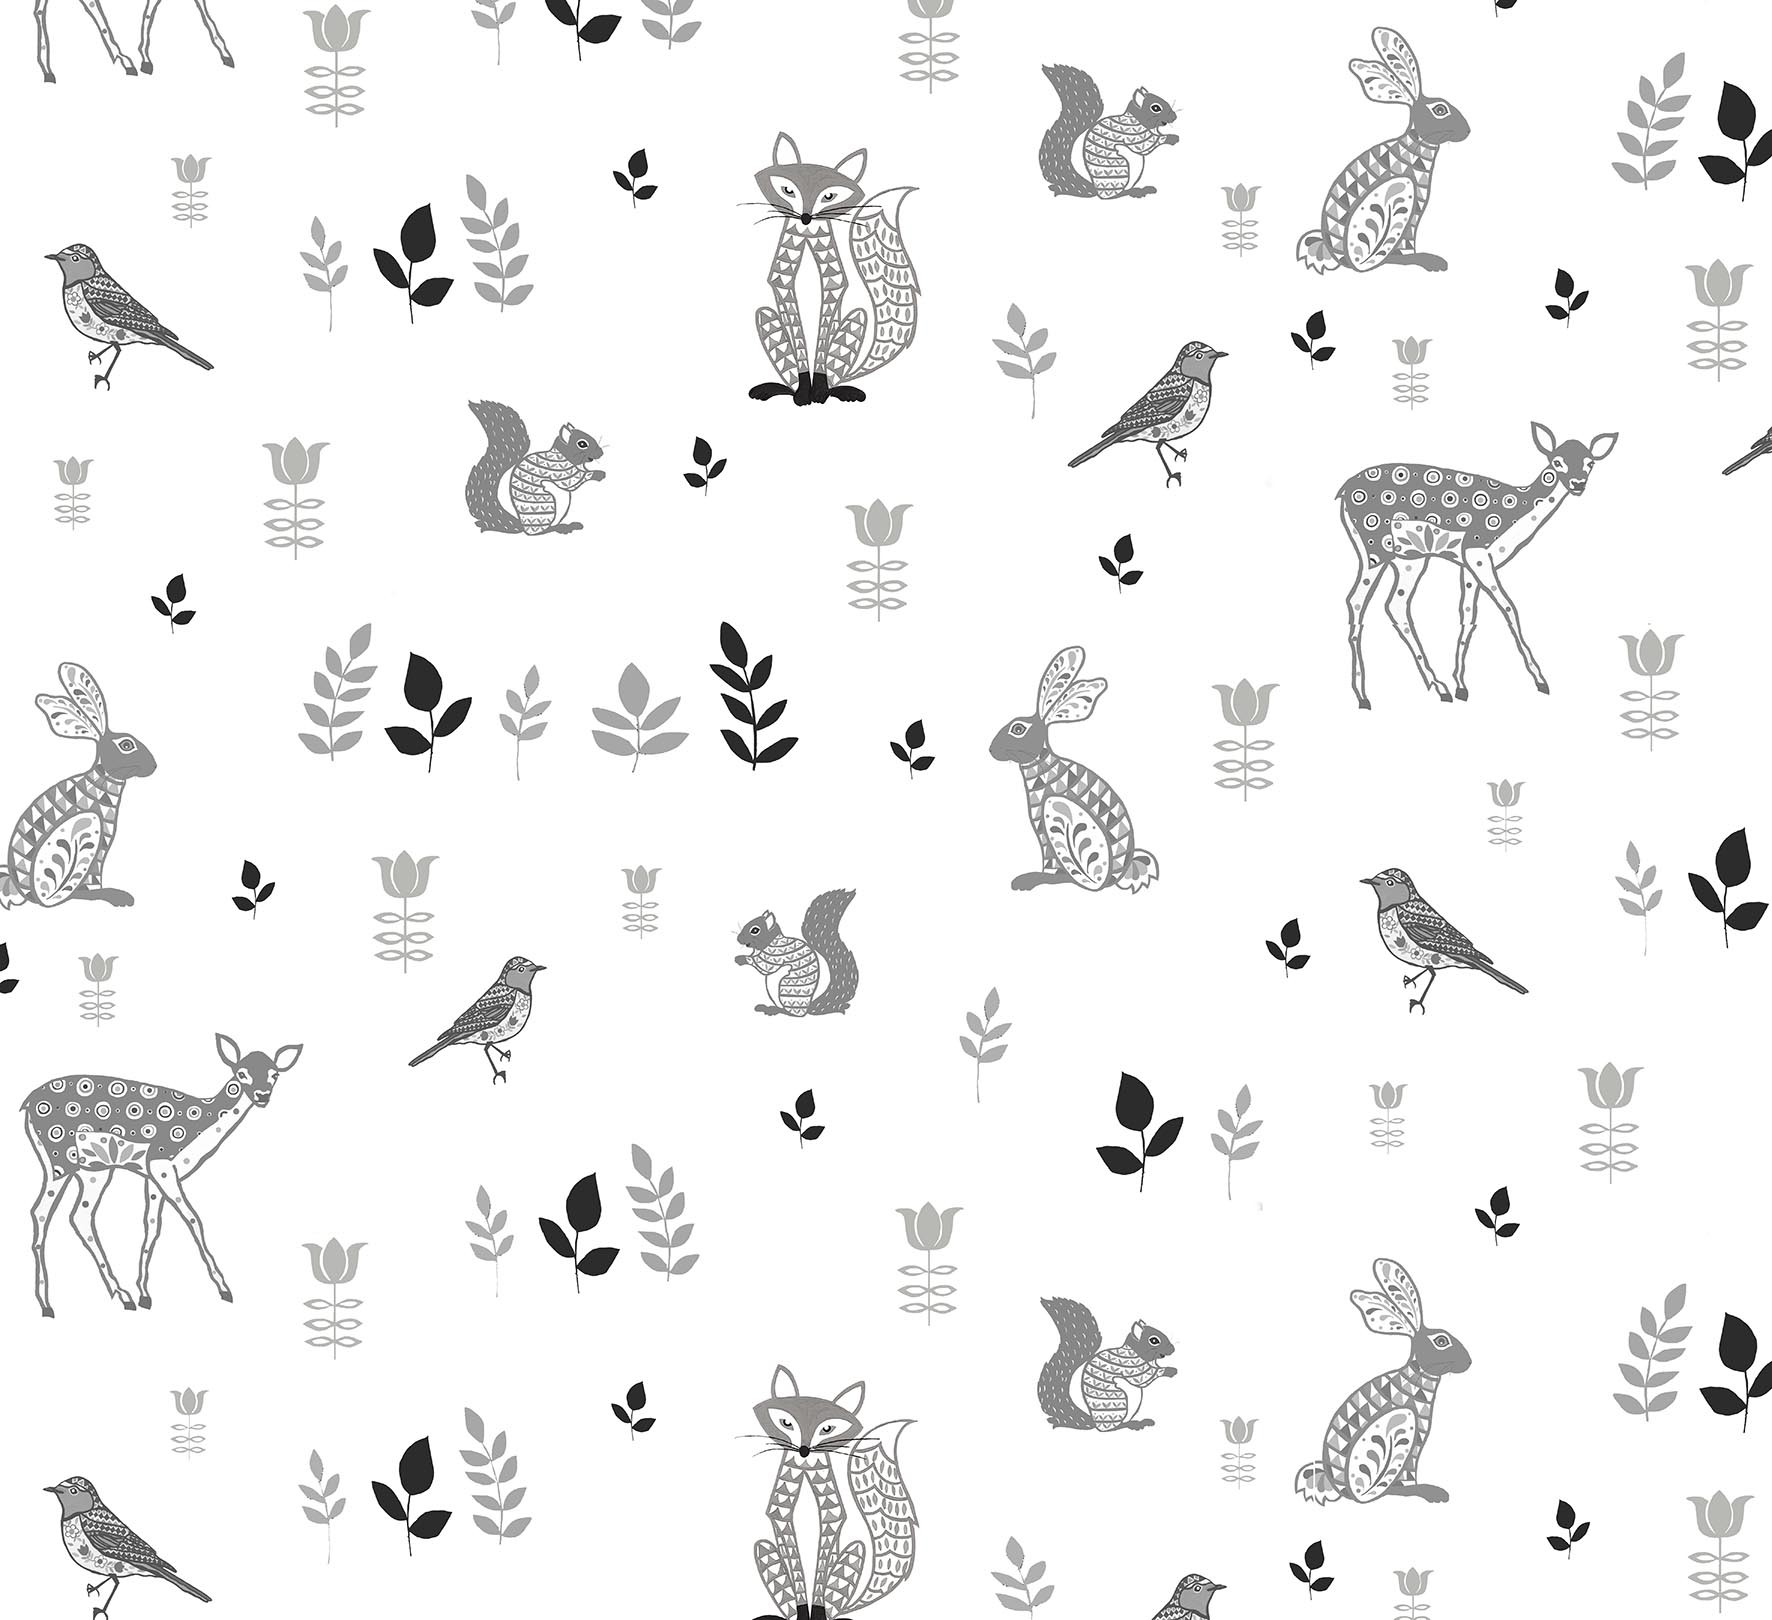 Woodland Animals Wallpaper Helen Gordon 1772x1620